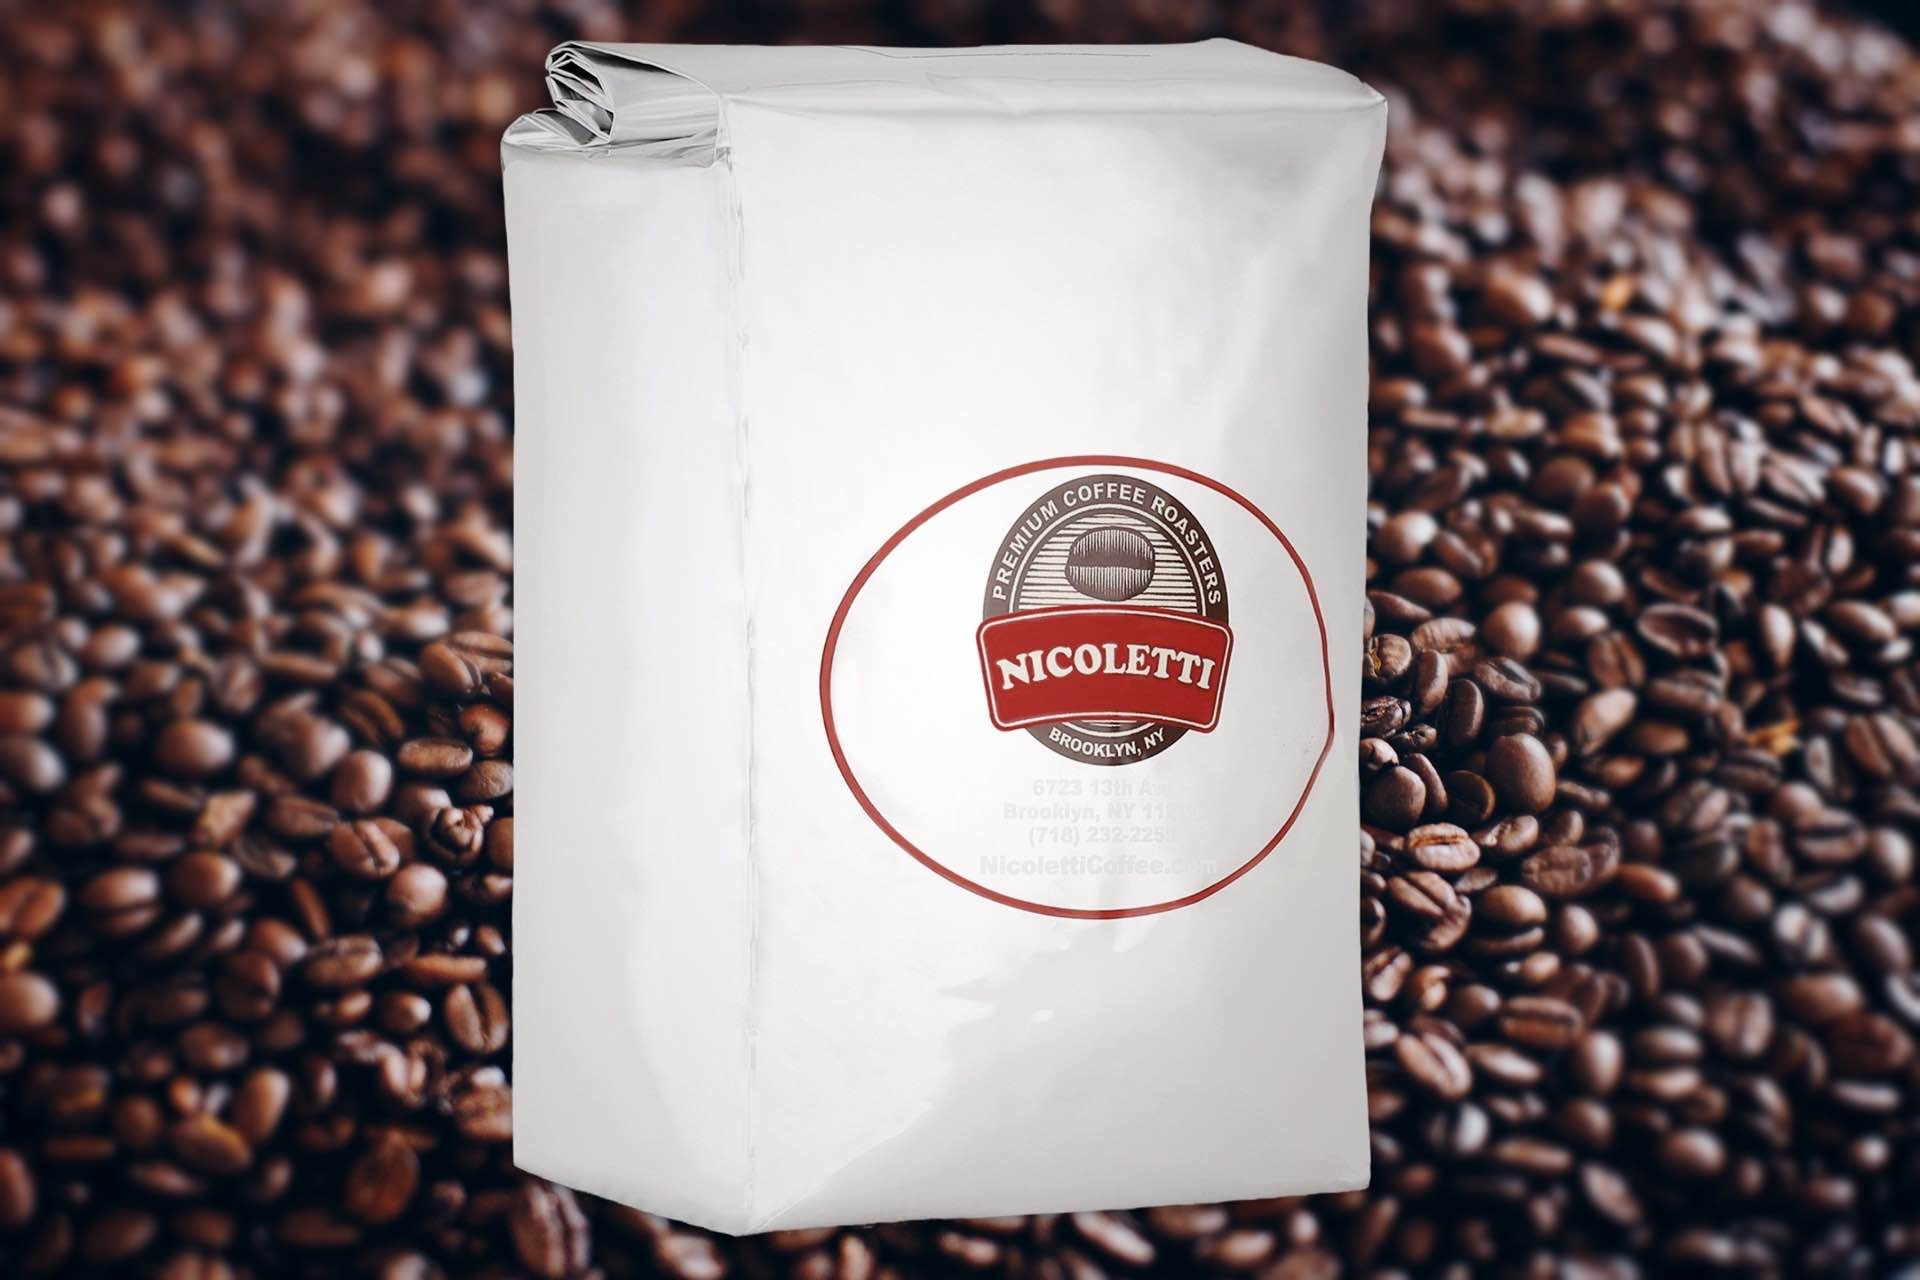 nicoletti-espresso-roast-coffee-beans